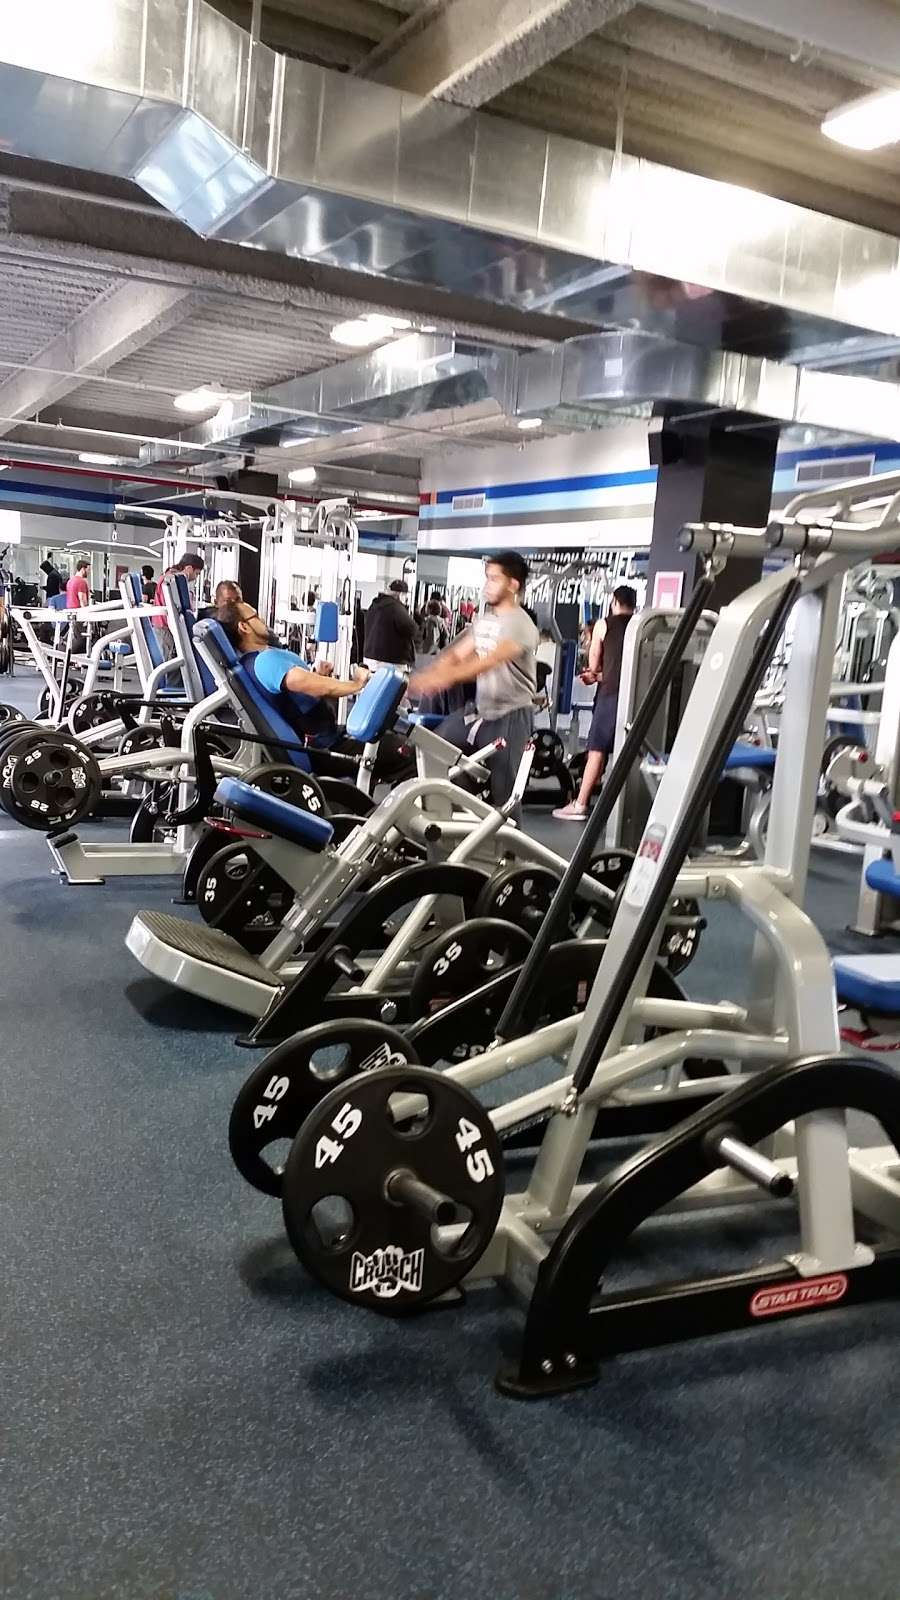 Crunch Fitness - Richmond Hill - gym  | Photo 1 of 10 | Address: 115-02 Jamaica Ave, Richmond Hill, NY 11418, USA | Phone: (646) 780-2050